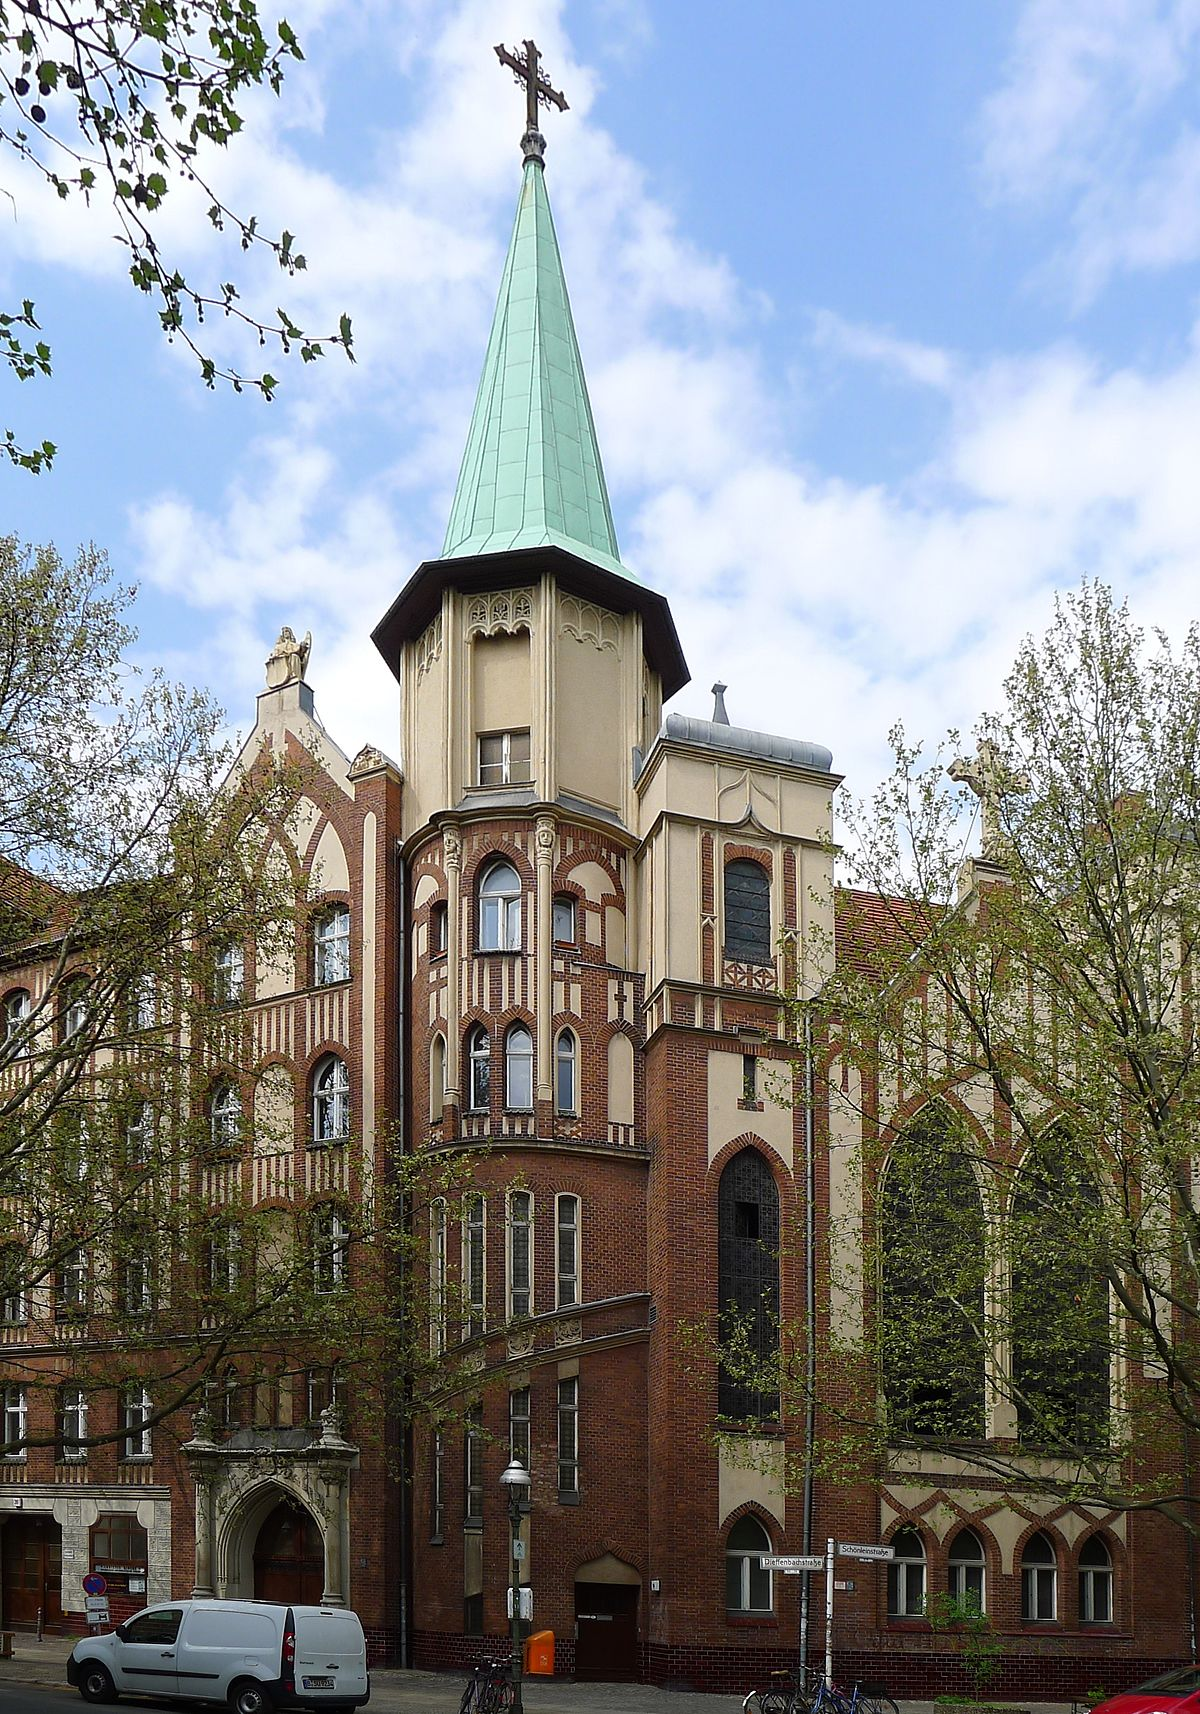 evangelisch methodistische christus kirche berlin kreuzberg wikipedia. Black Bedroom Furniture Sets. Home Design Ideas